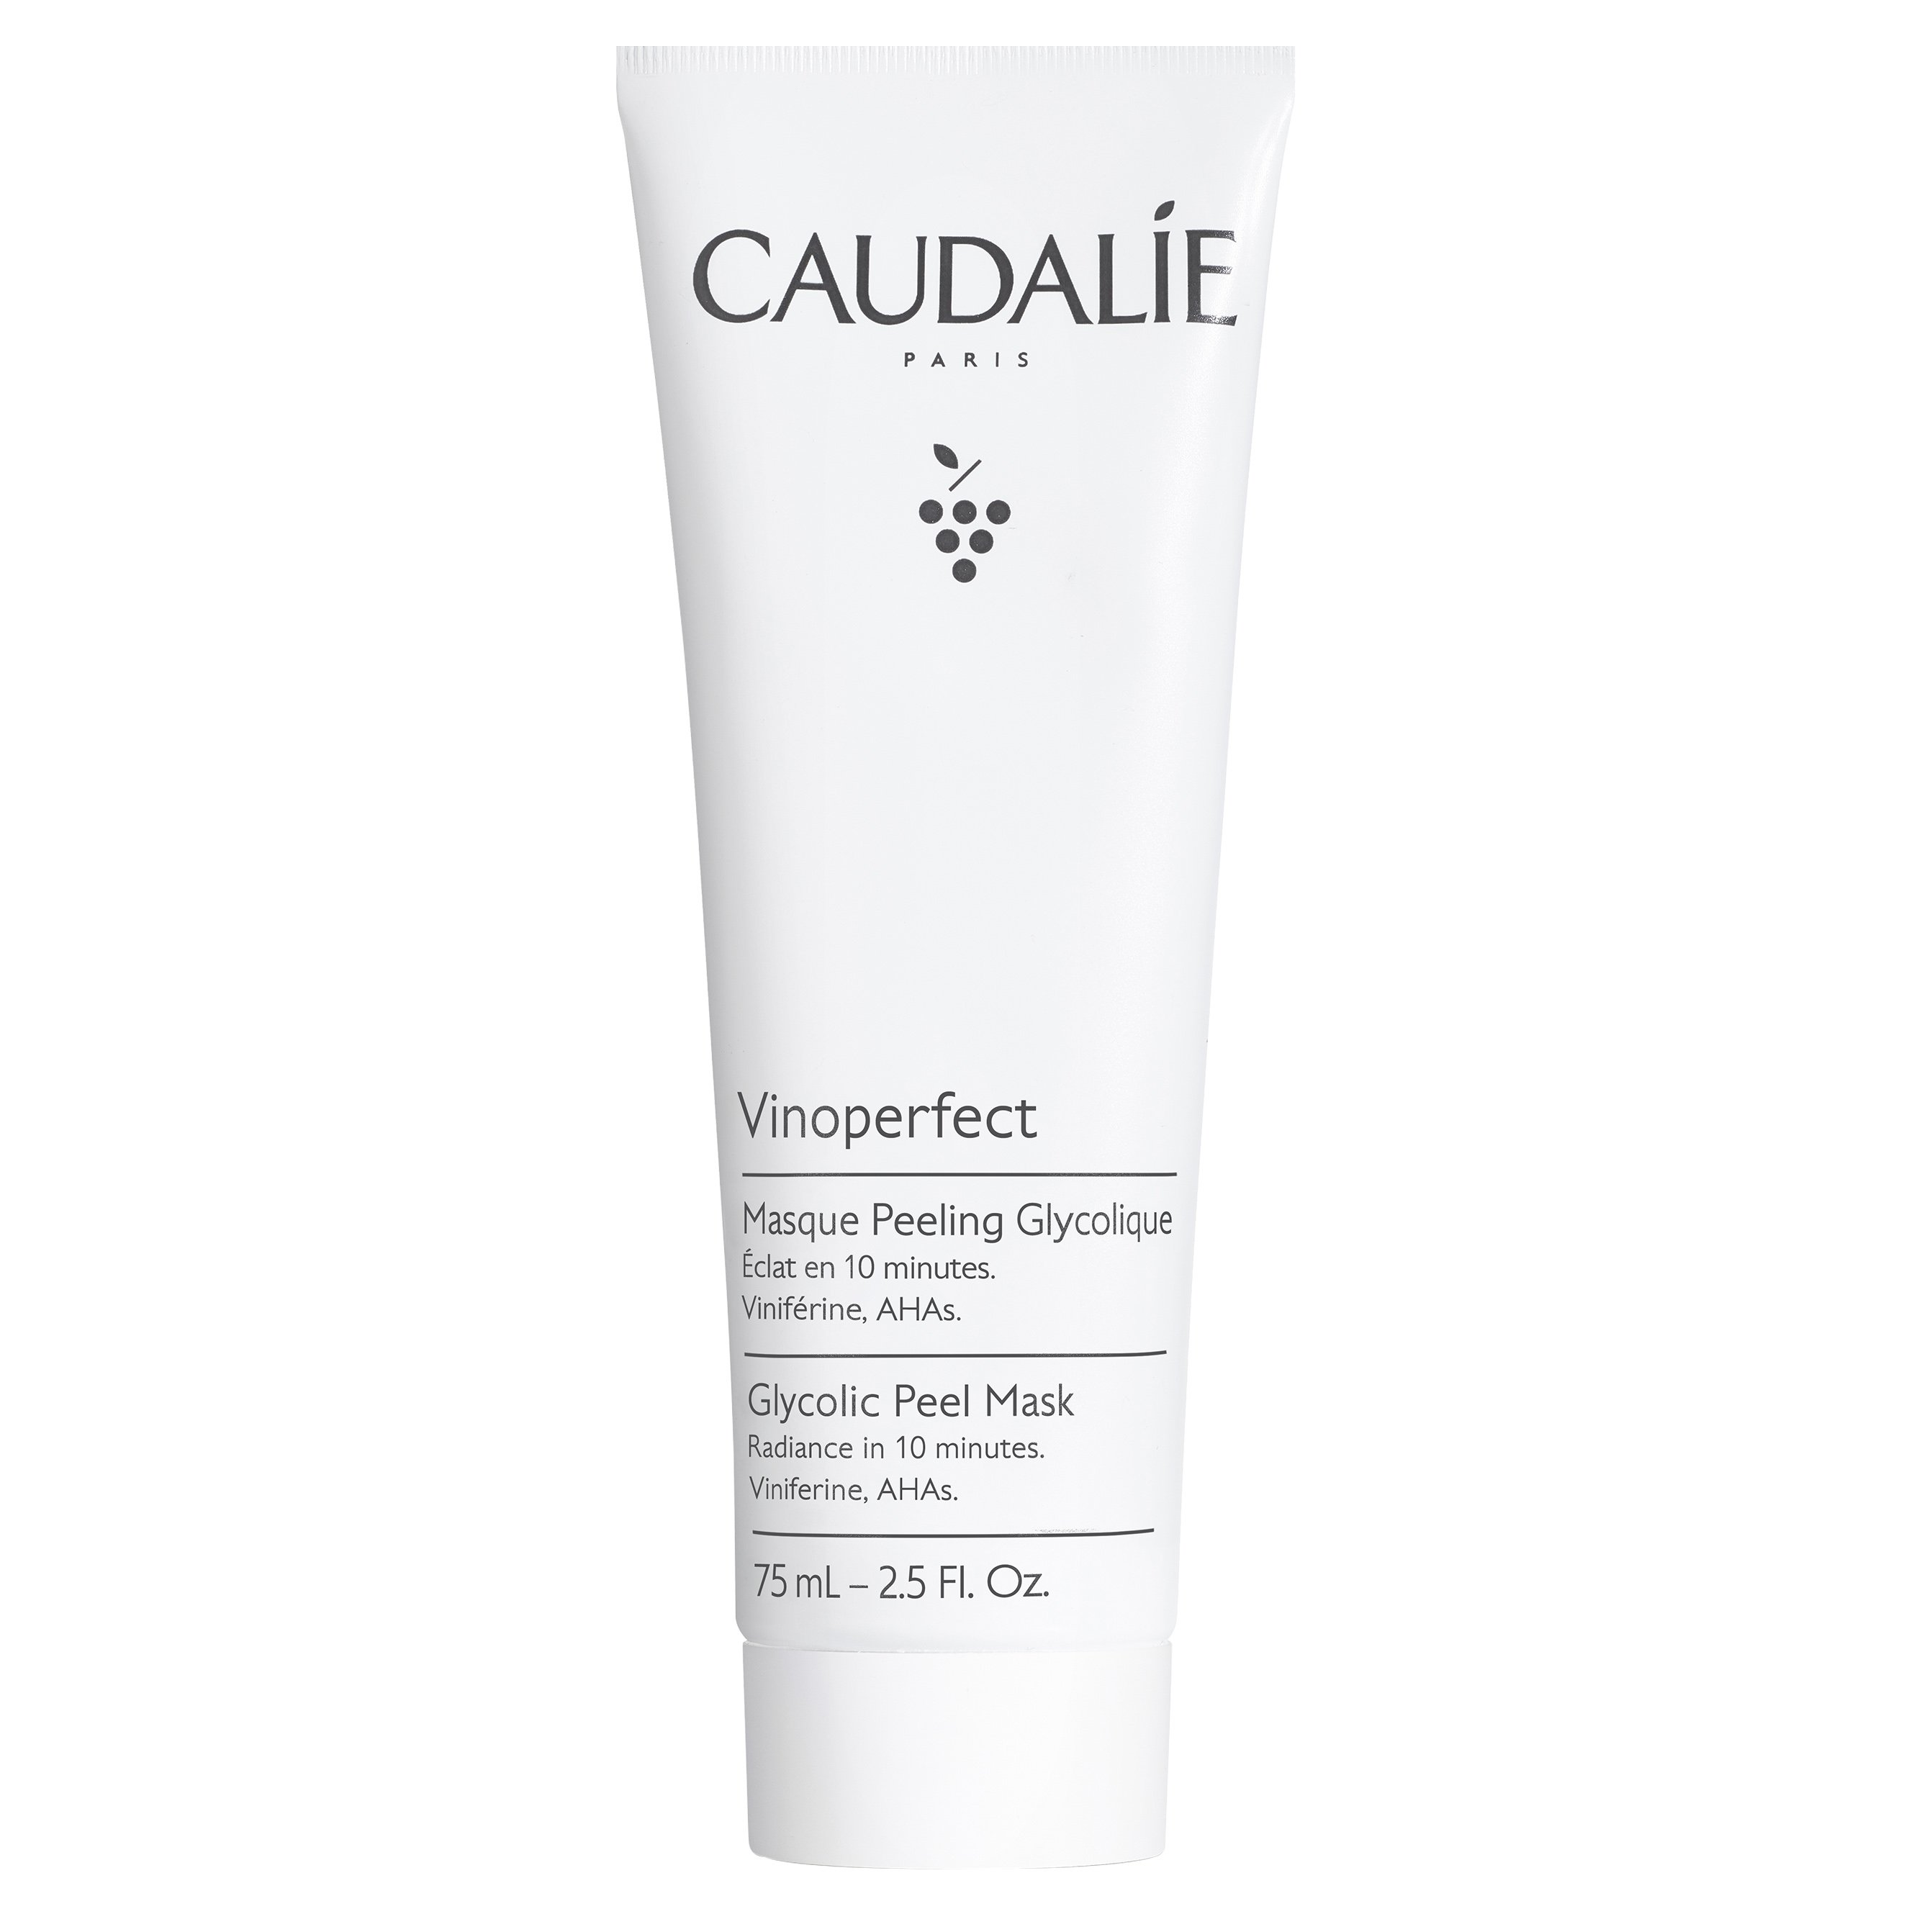 Caudalie Vinoperfect Glycolic Peel Mask Μάσκα Προσώπου Λάμψης & Απολέπισης 75ml